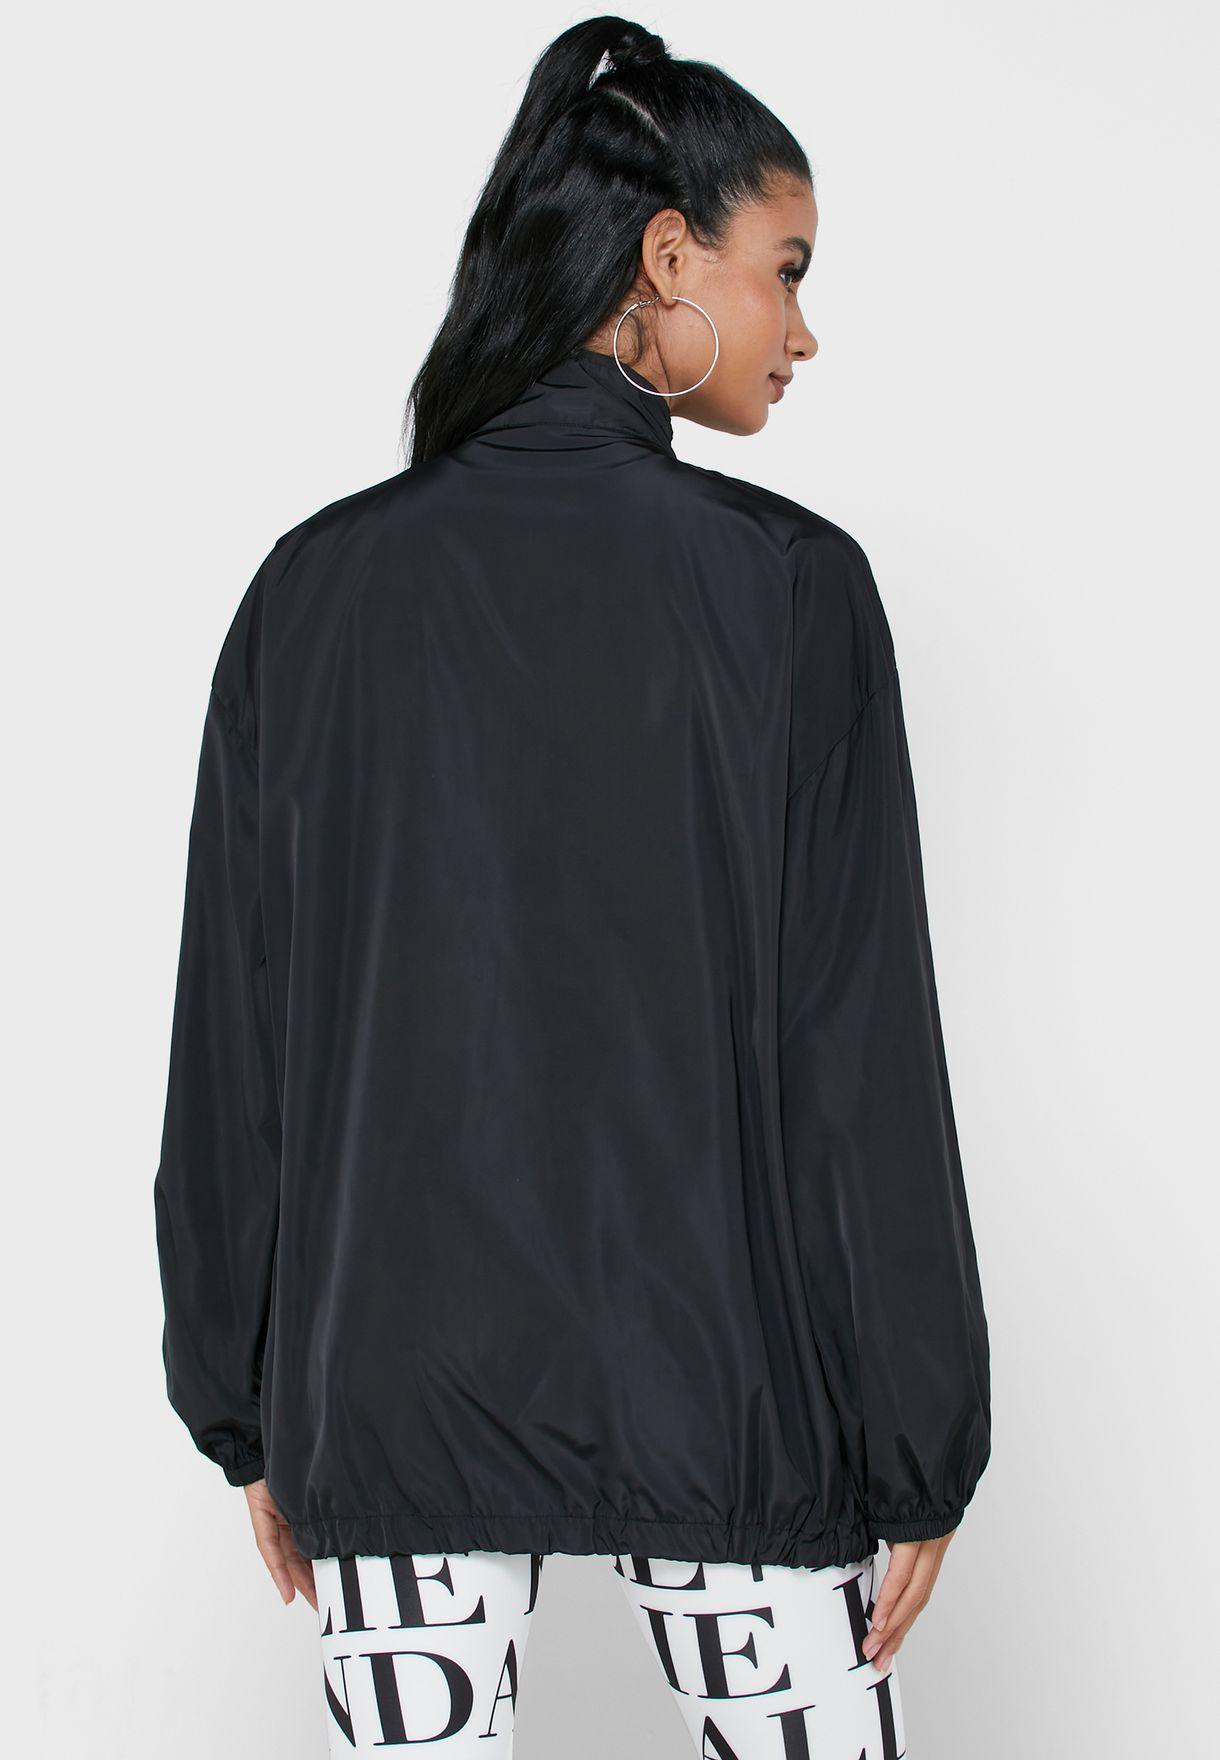 Colorblock Bomber Jacket